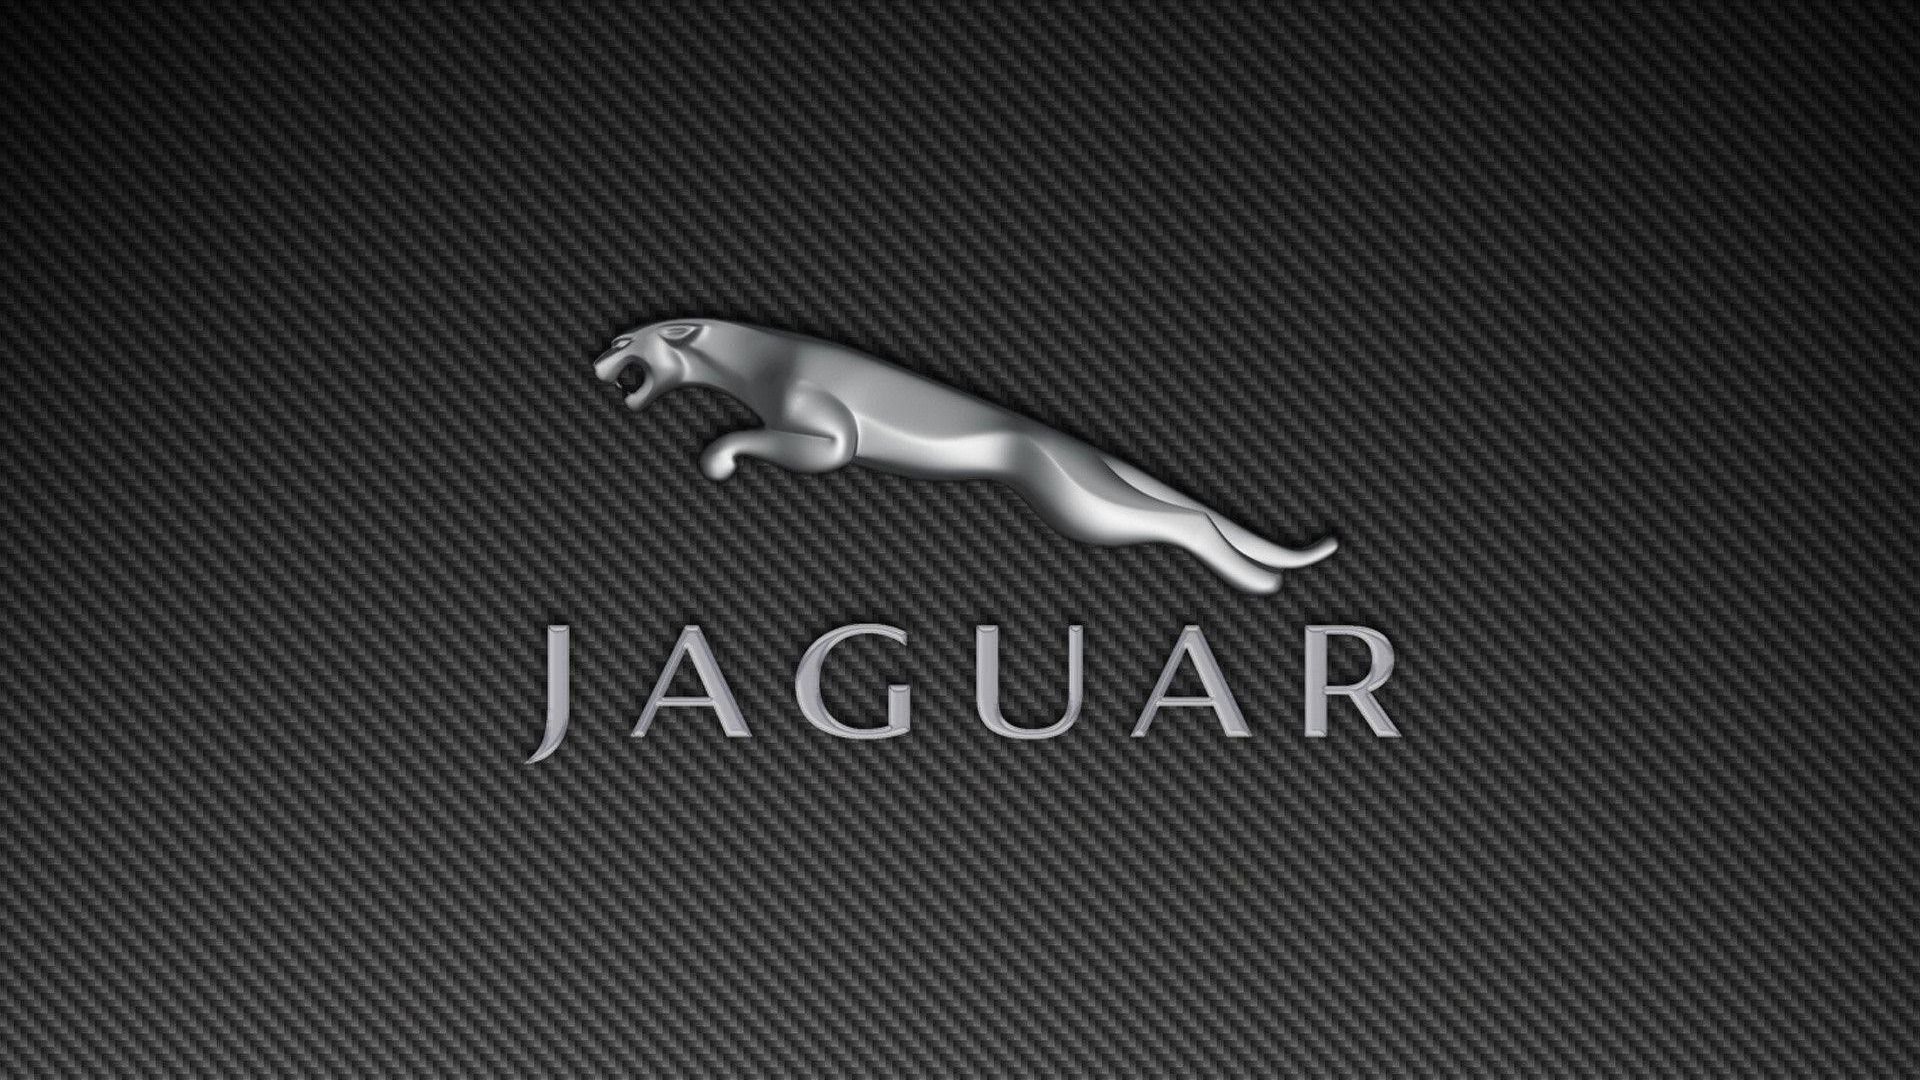 Jaguar Car Brand Logo With Pattern Background Car Brand Logos